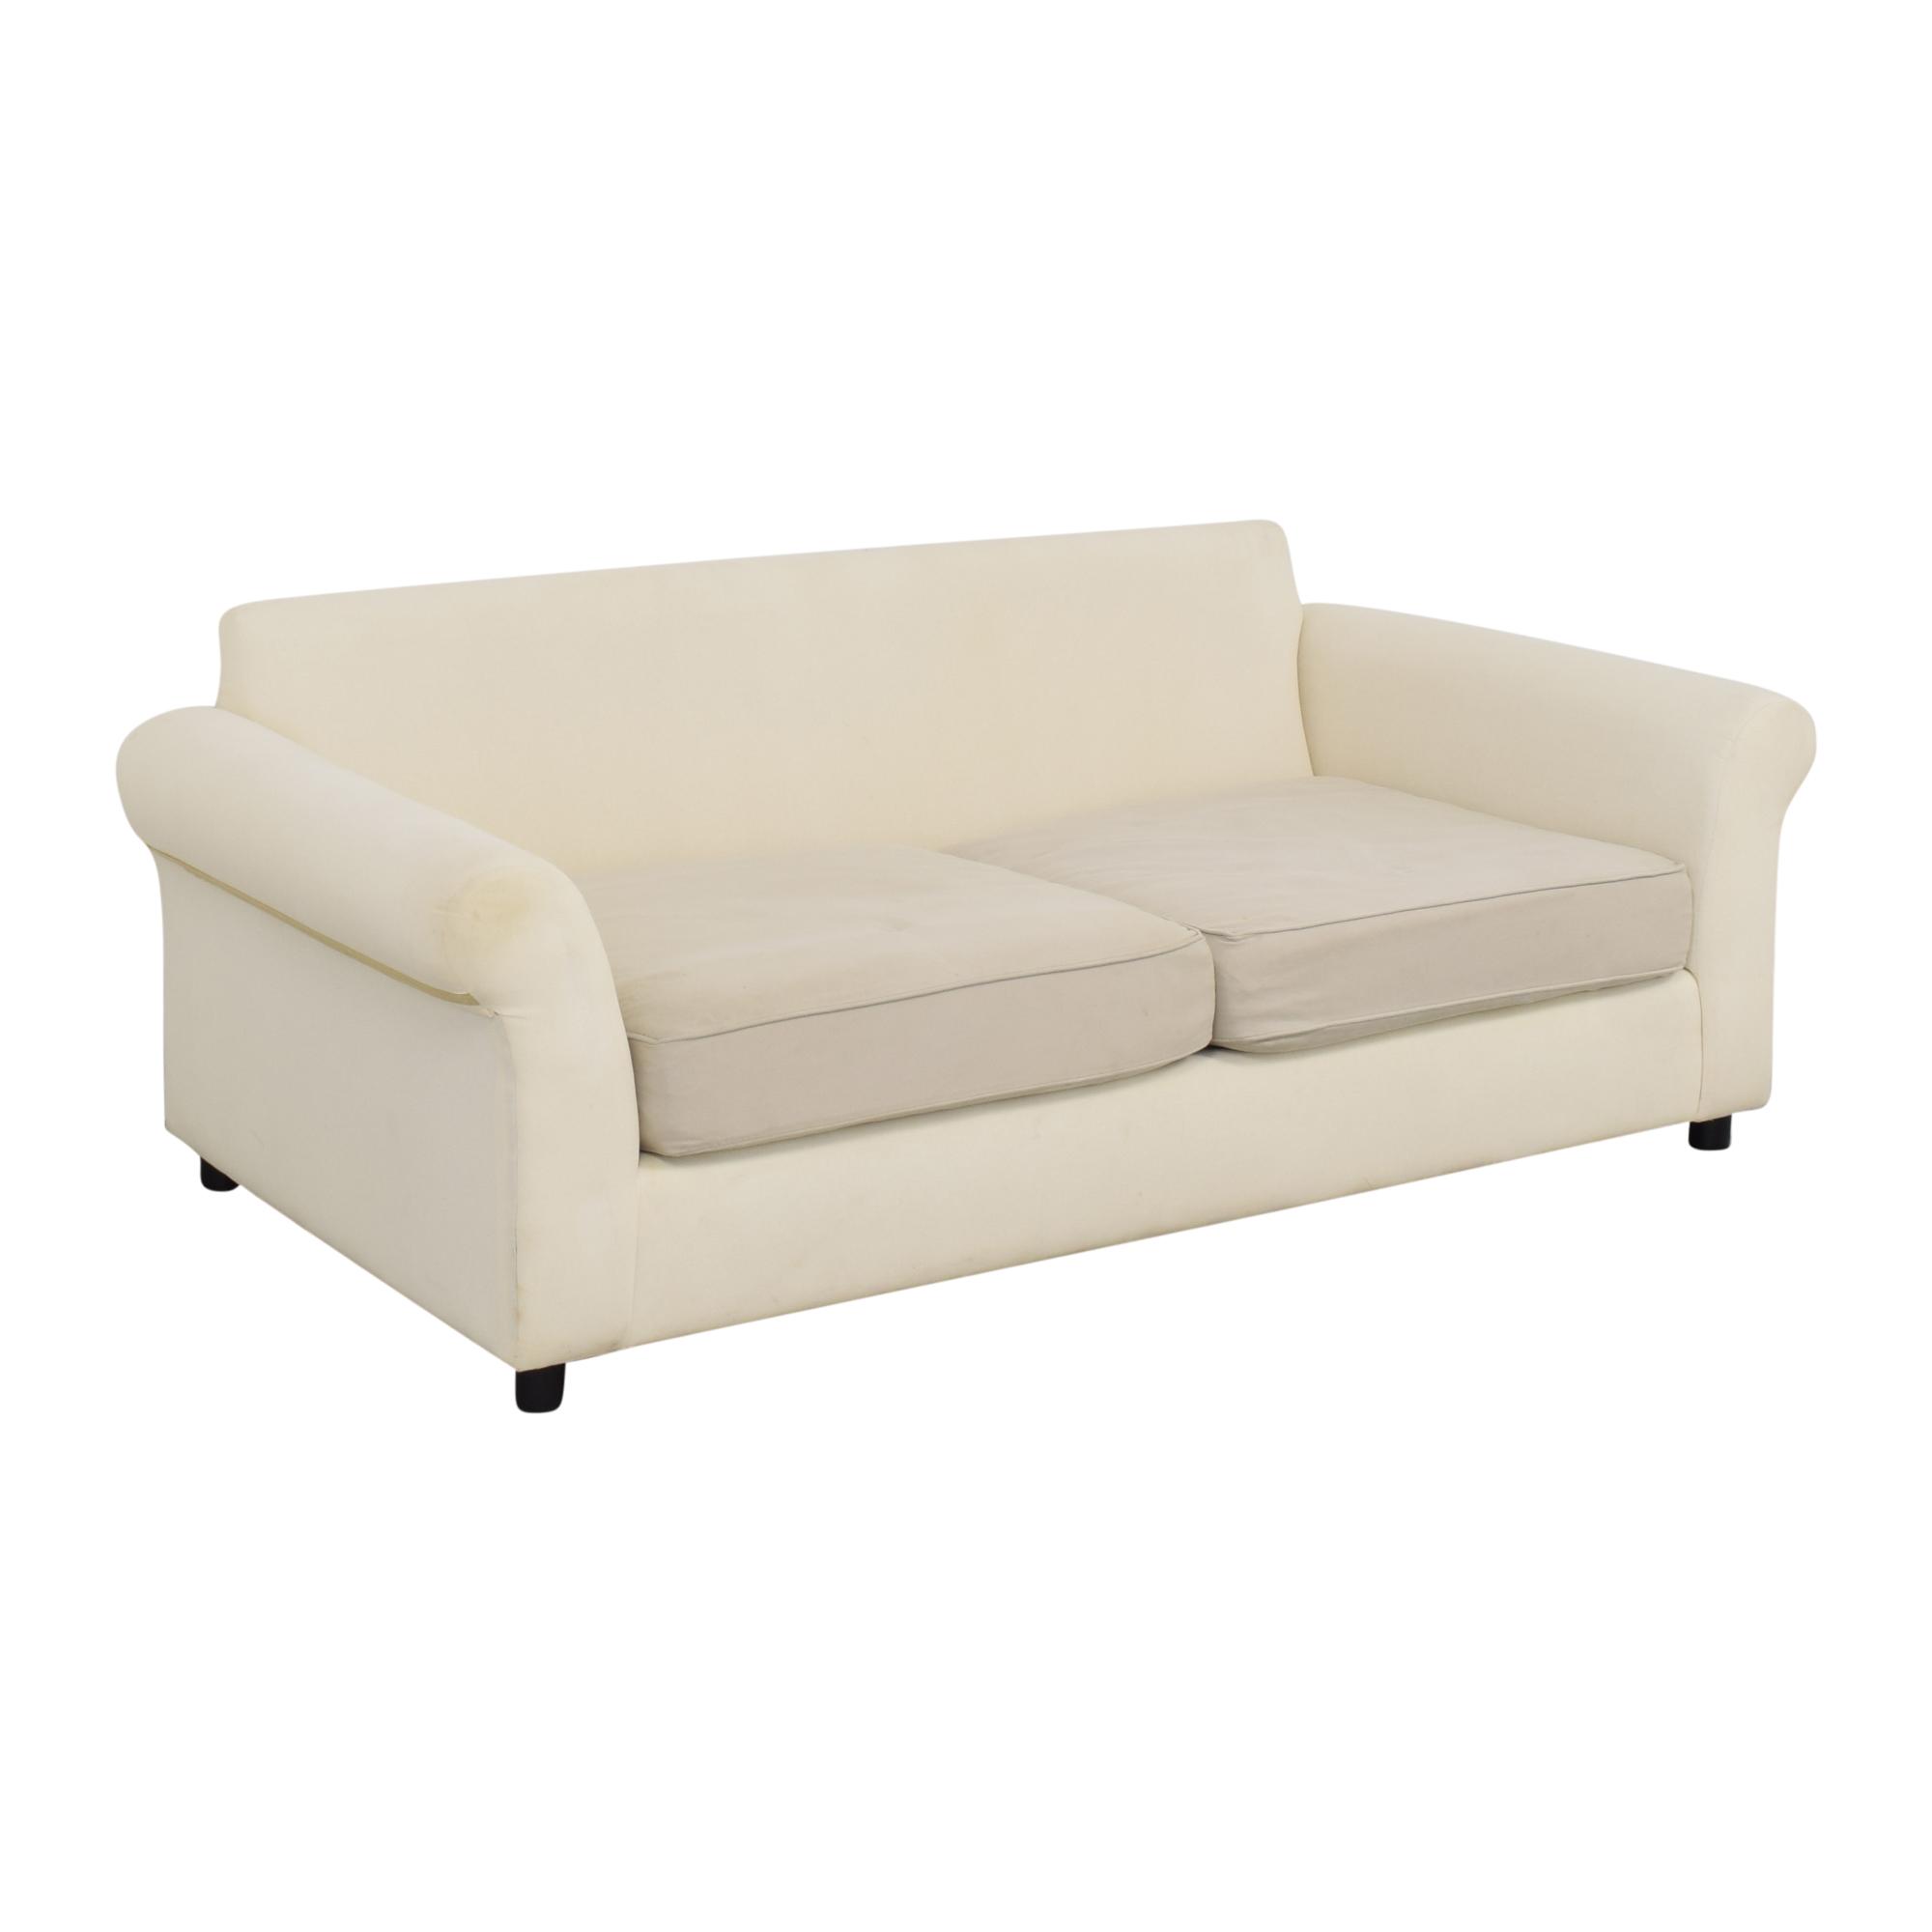 Pottery Barn Pottery Barn Comfort Collection Two Cushion Sofa on sale